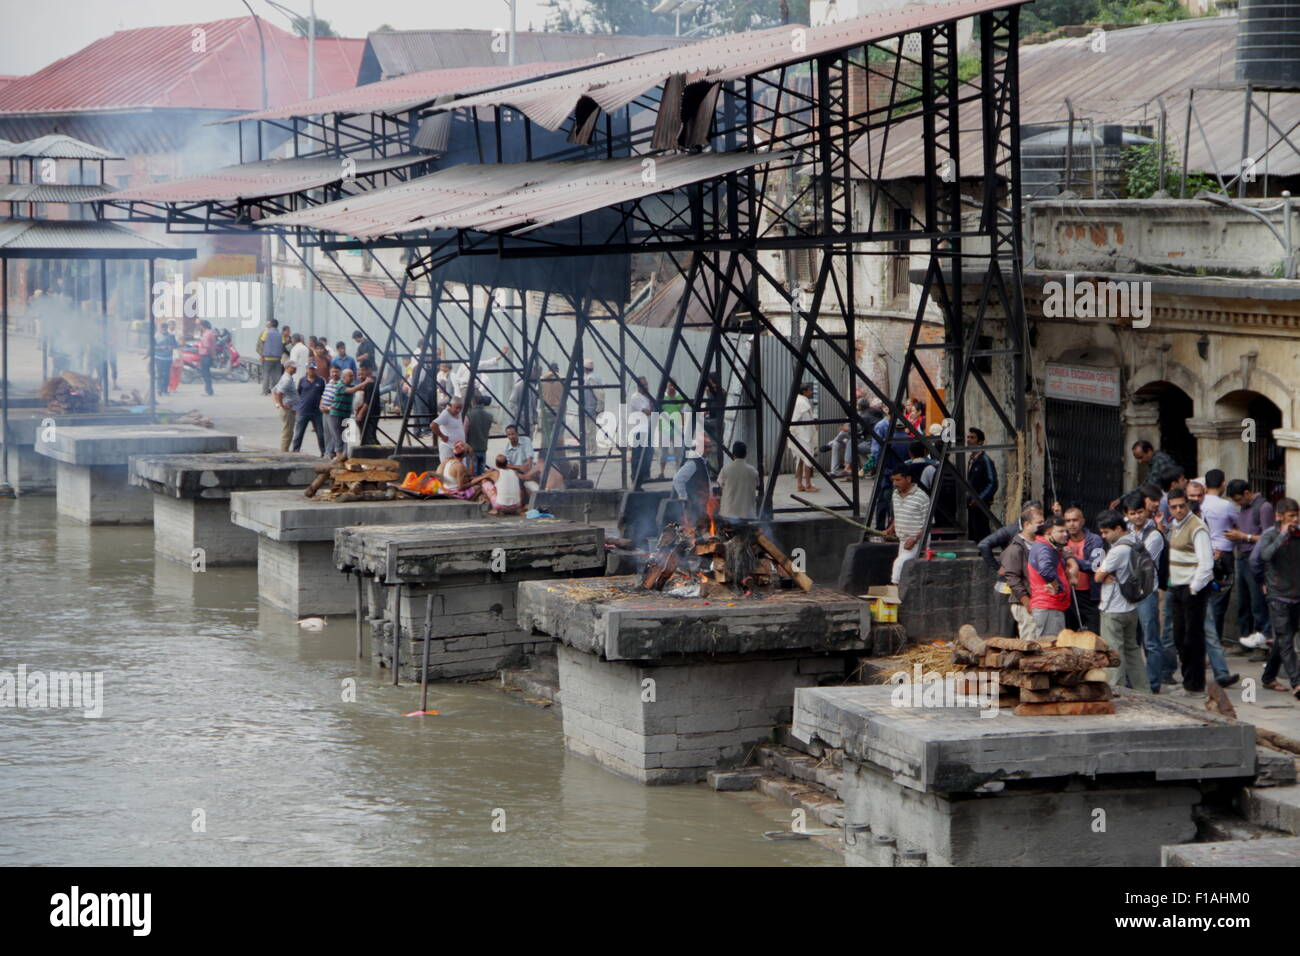 Hindu cremation rituals at the banks of Bagmati river at Pashupatinath Temple in Kathmandu - Stock Image